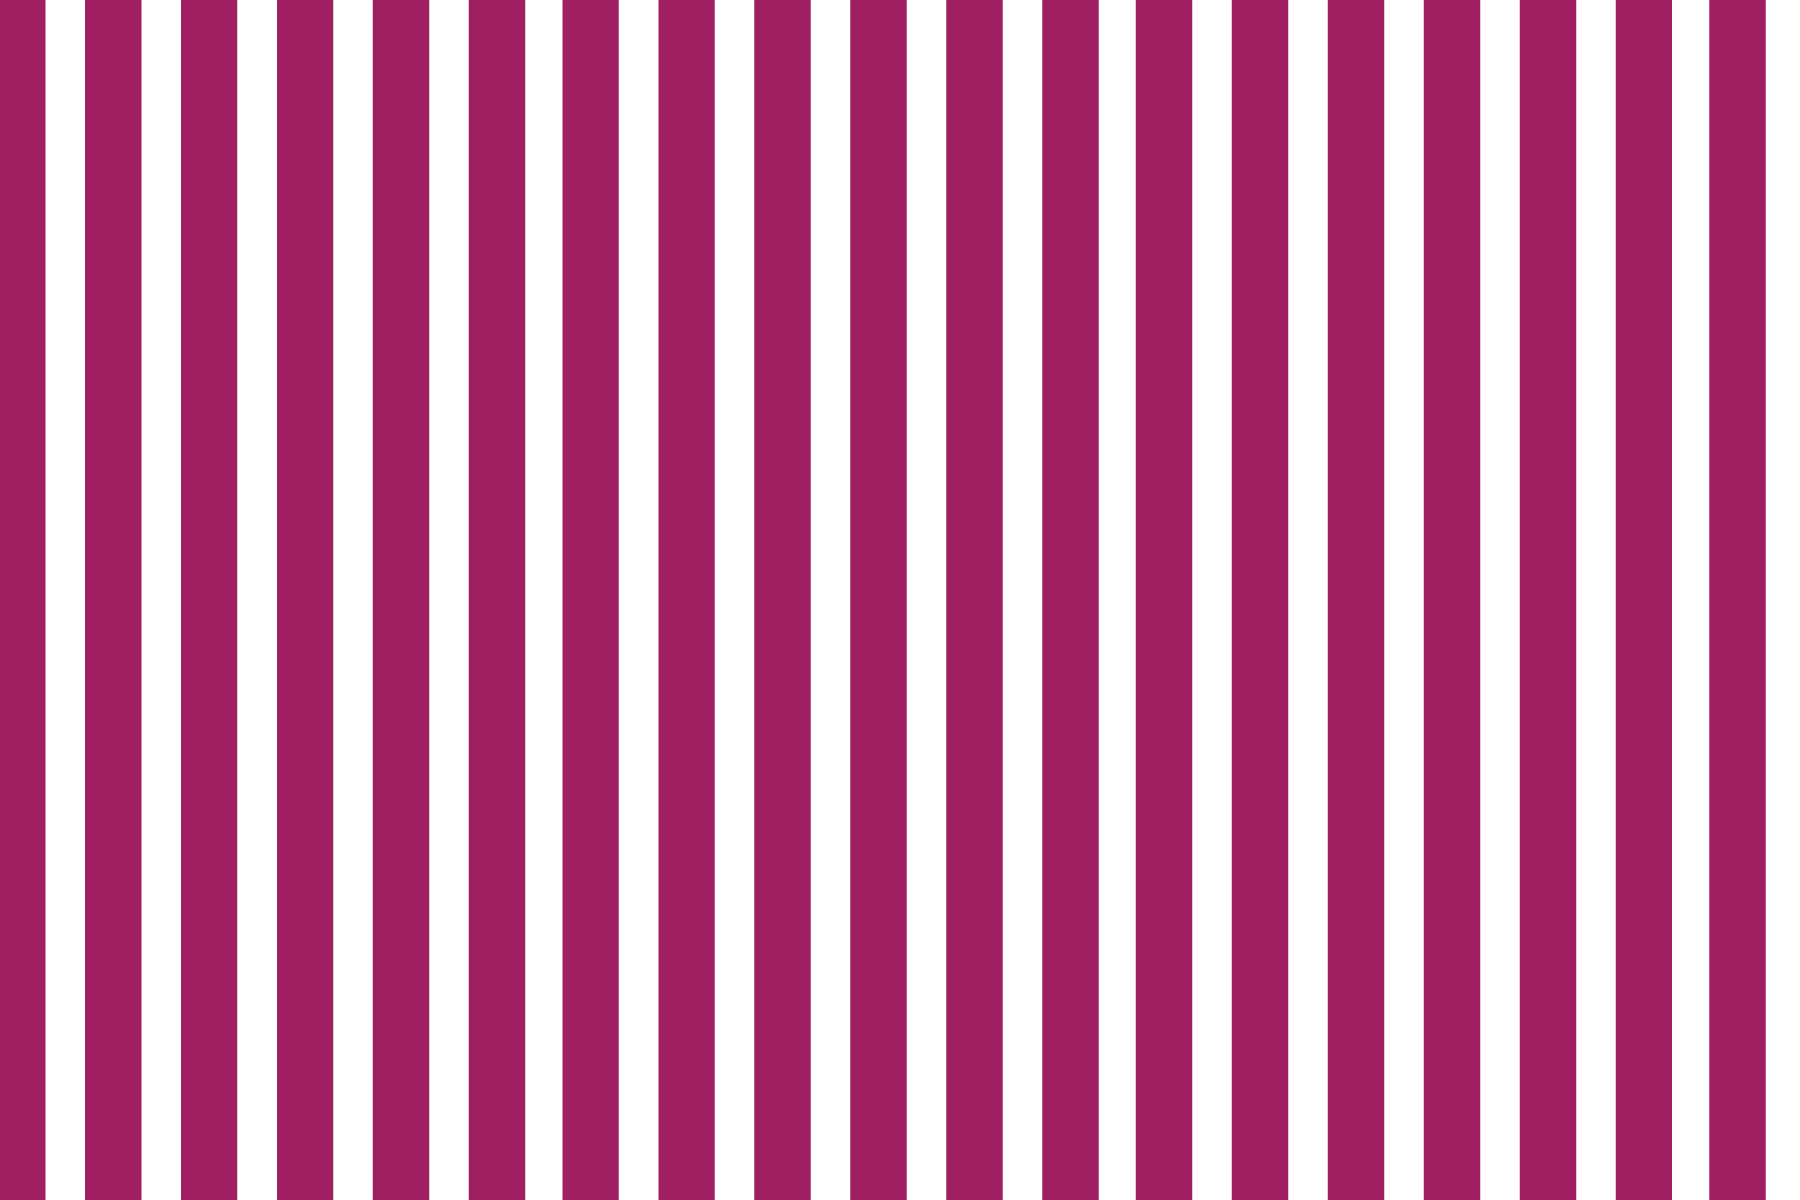 Vertical Stripe-01.jpg